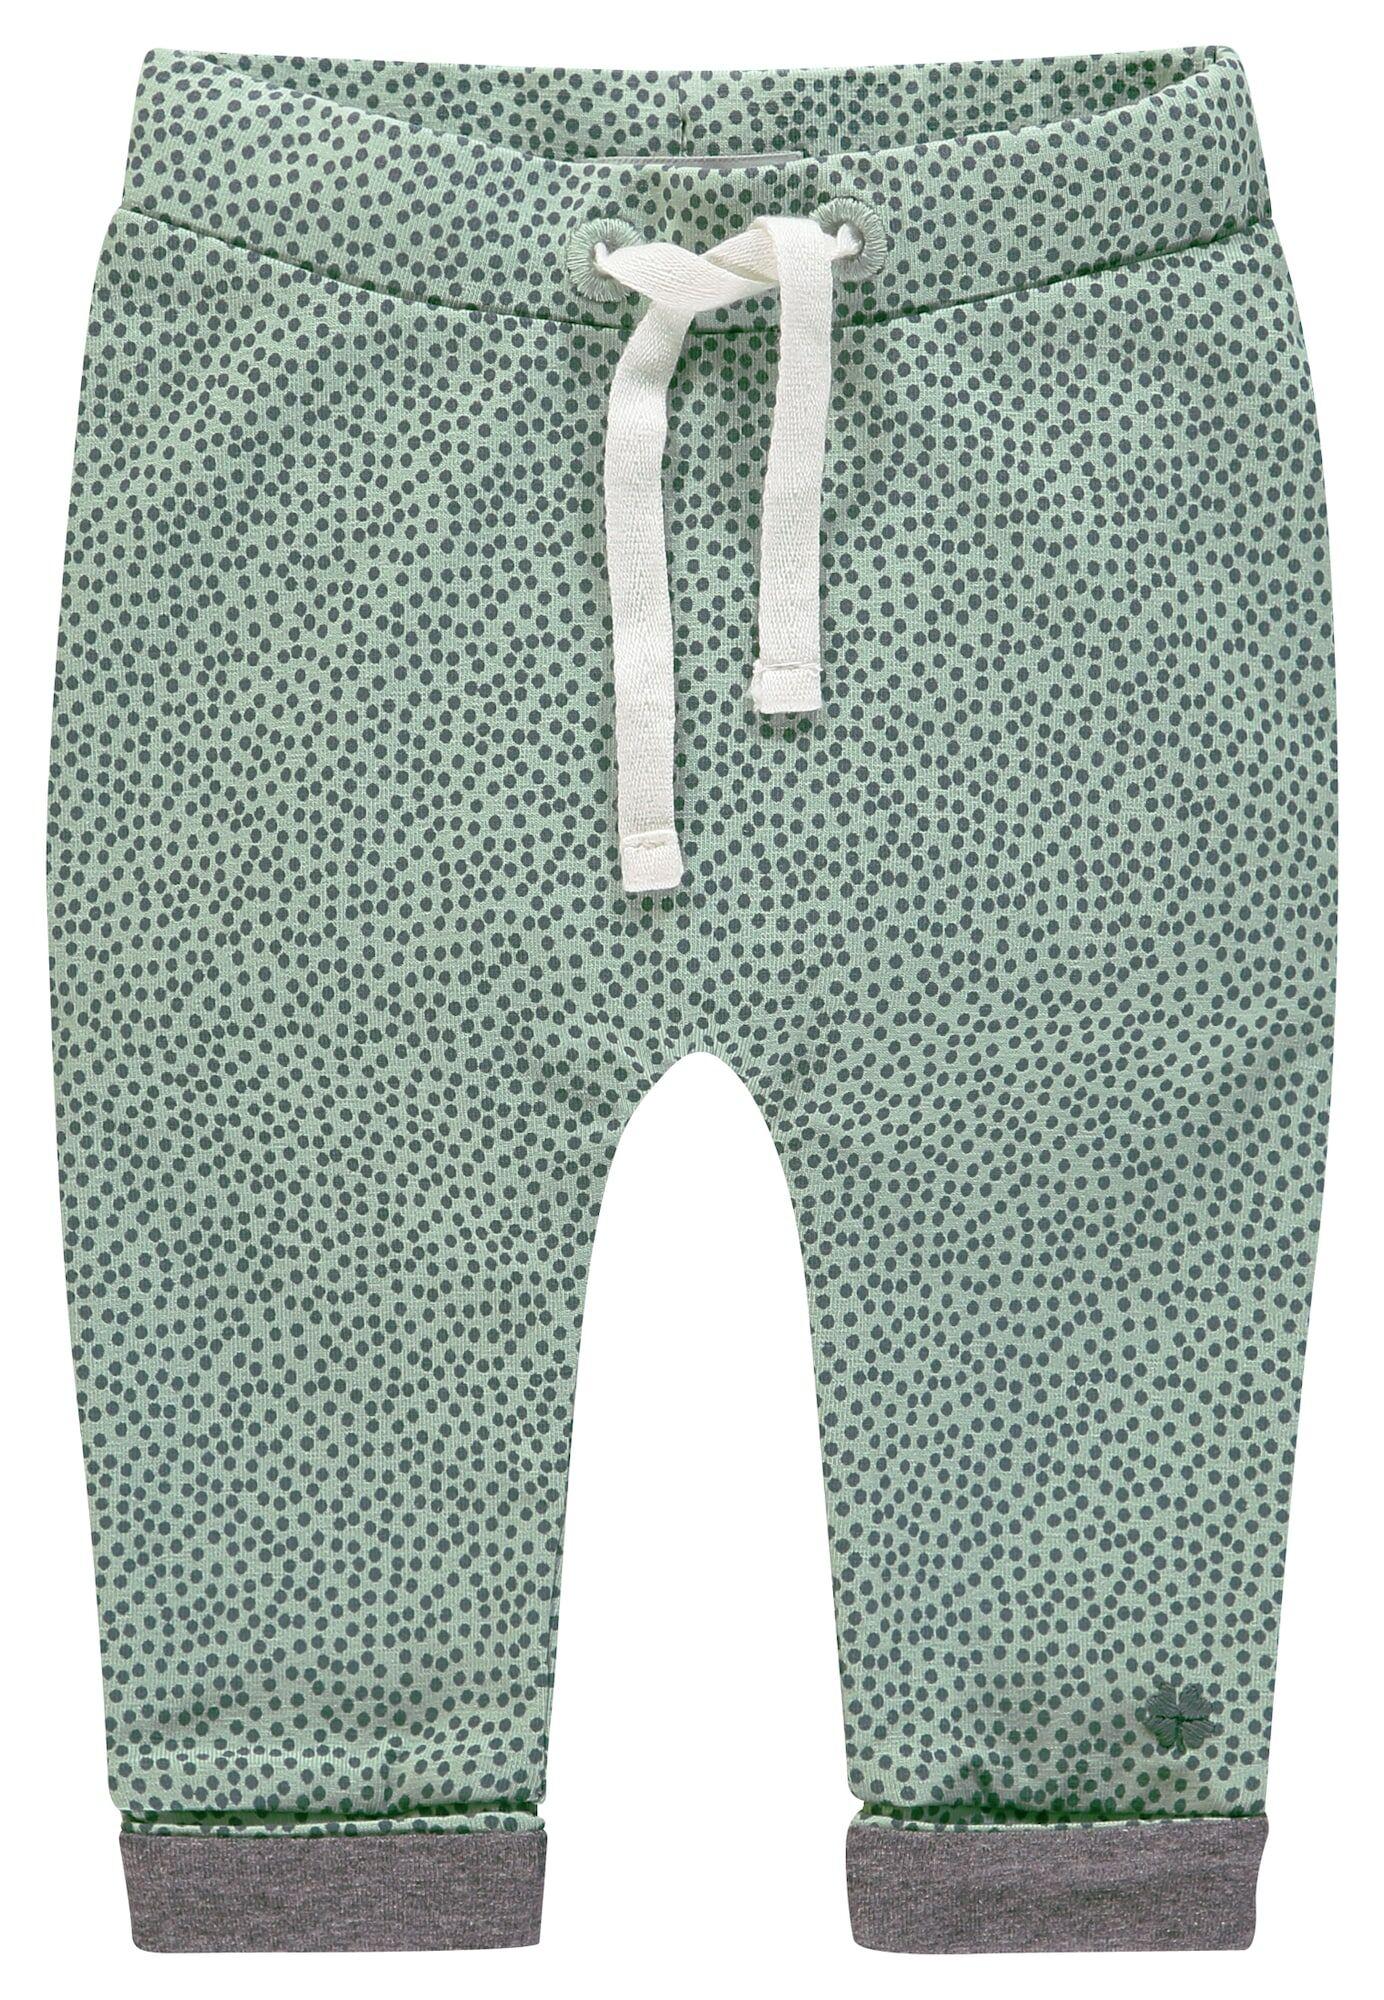 Noppies Pantalon 'Kirsten'  - Vert - Taille: 50 - kids